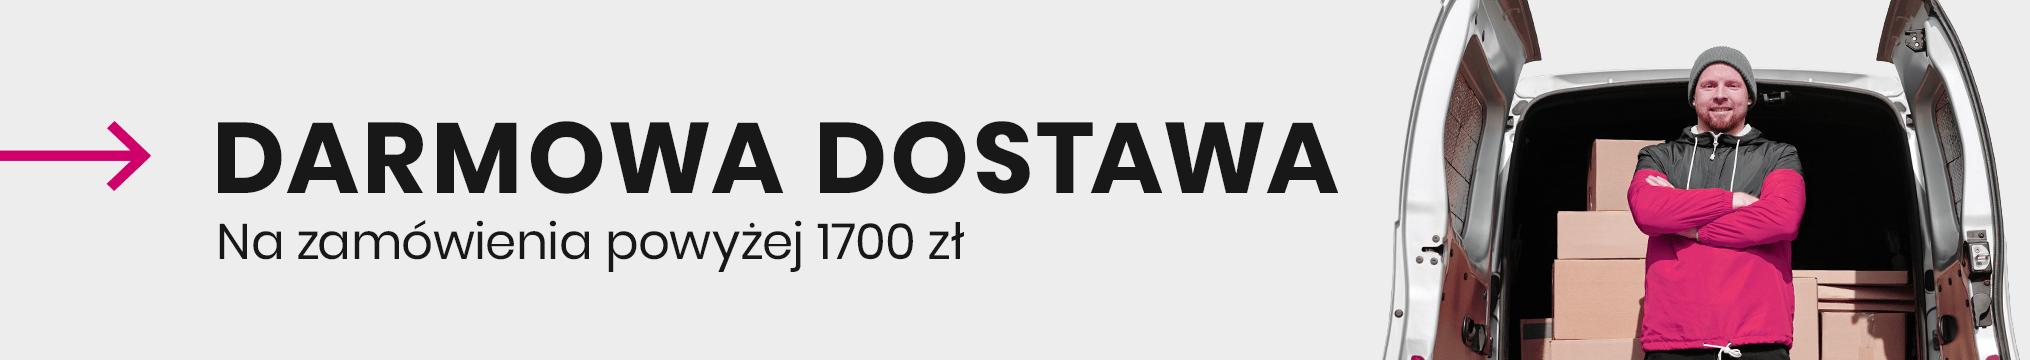 header-baner-darmowa-dostawa-1700.png